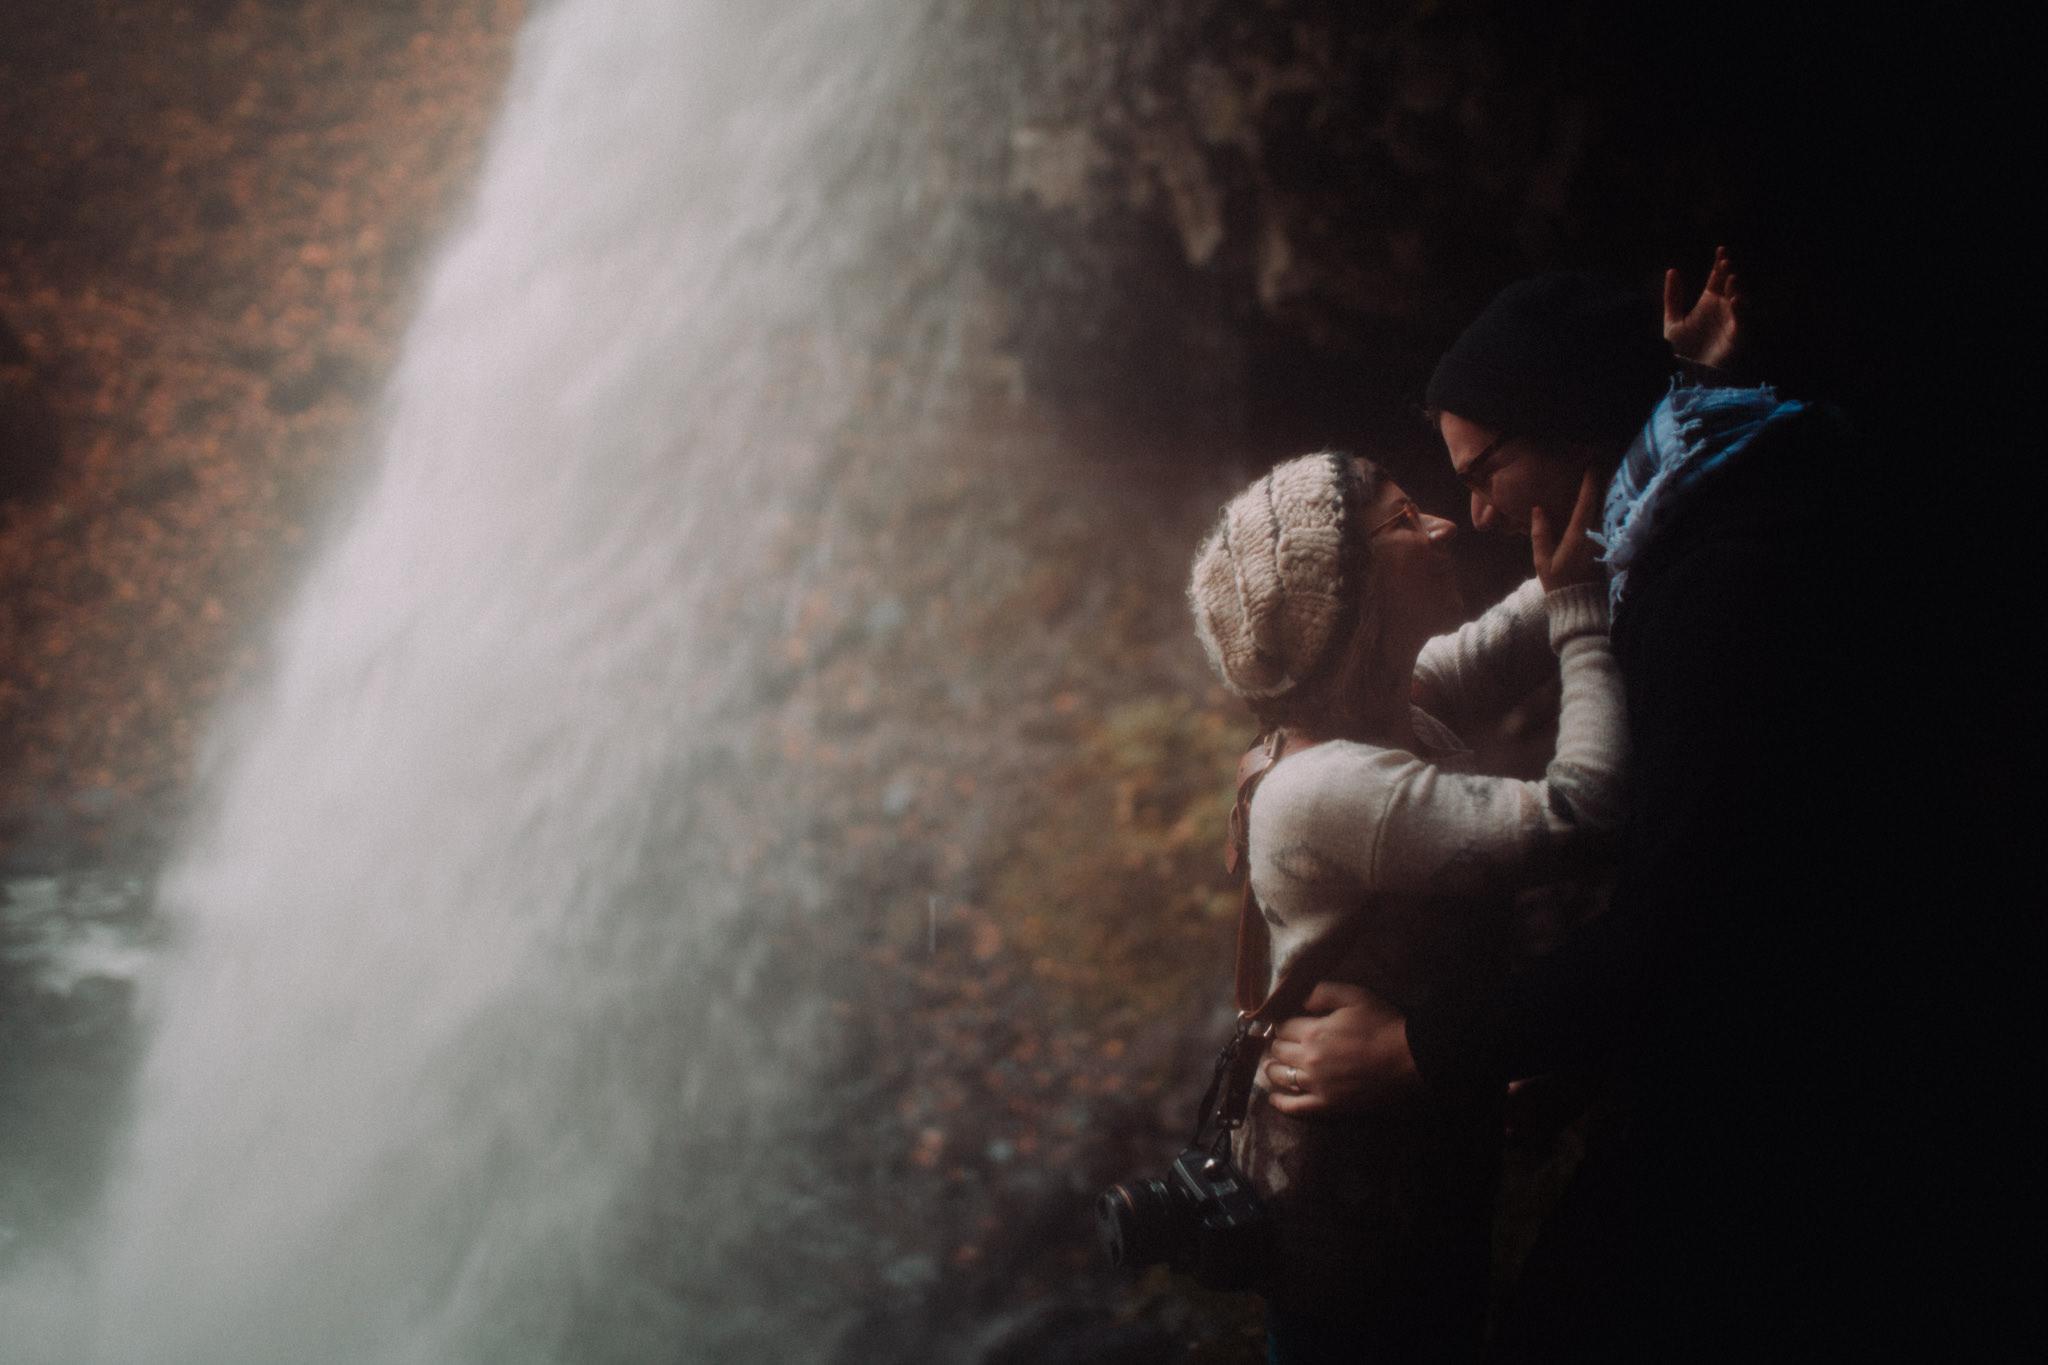 oregon-wedding-elopement-photographer-donmashelen-bringas8